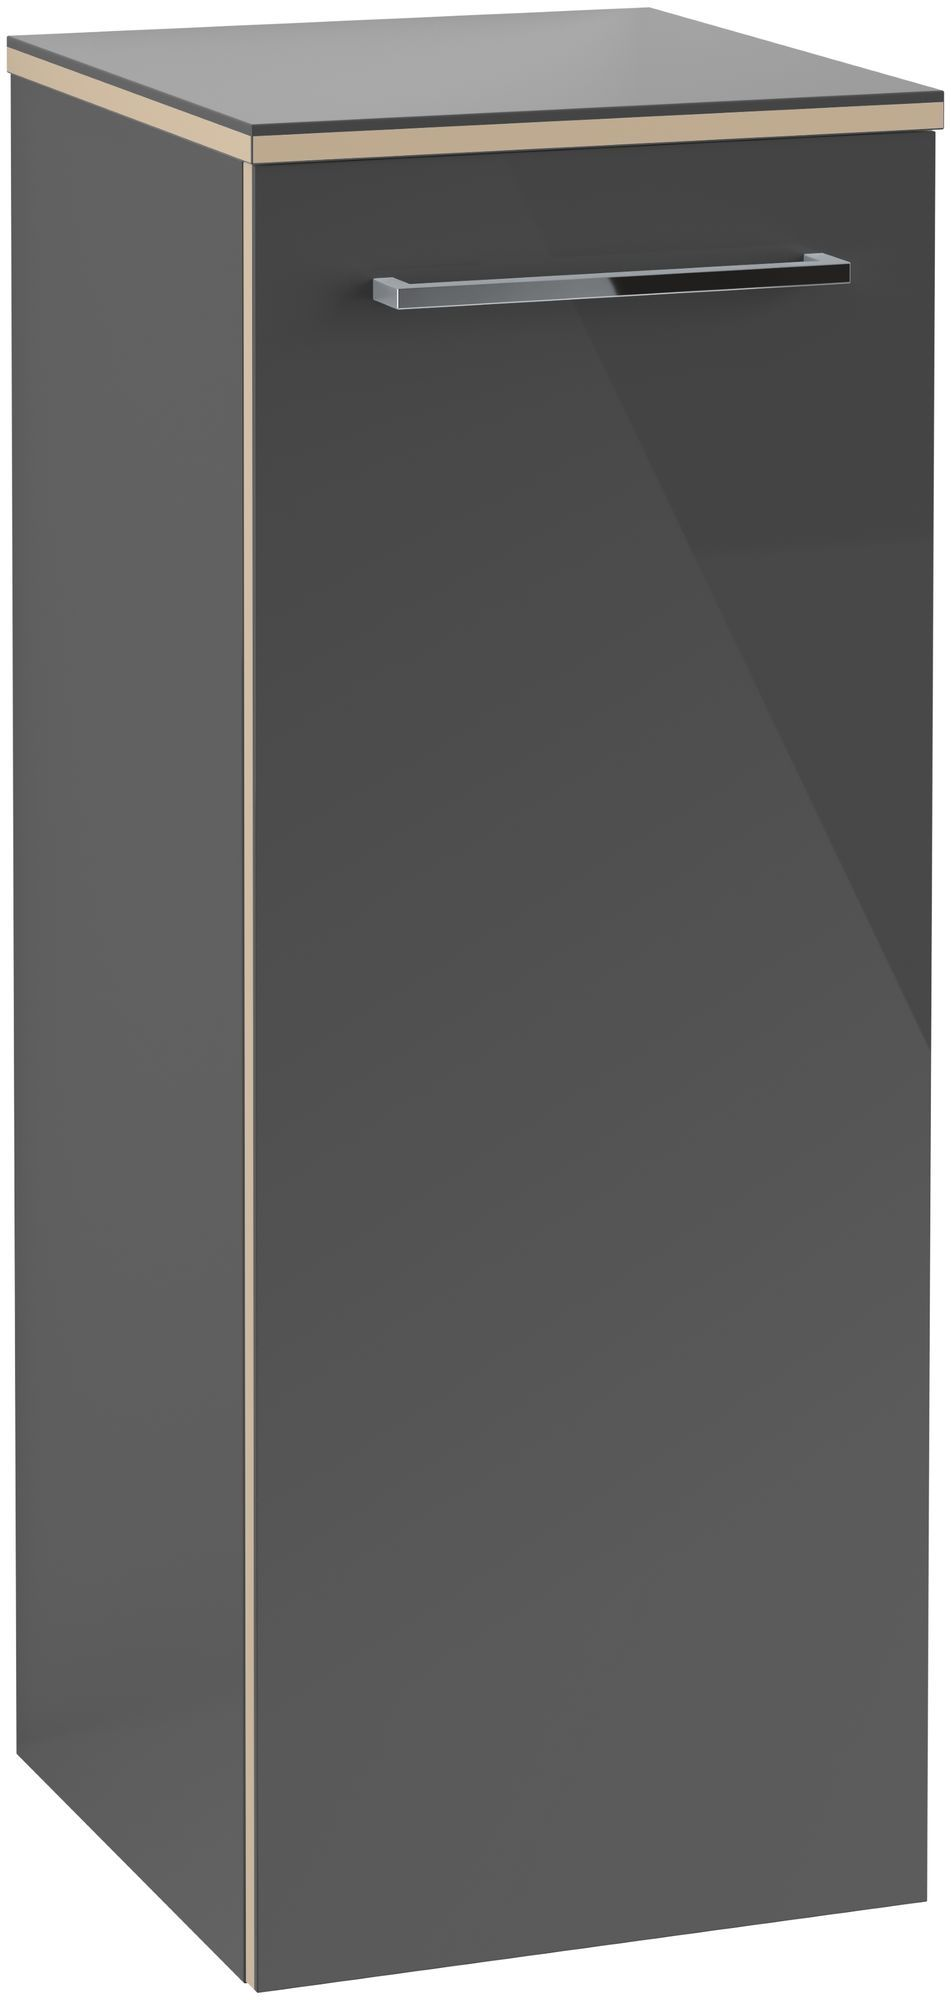 Villeroy & Boch Avento Seitenschrank Türanschlag links B:35 x H:89,2 x T:37 cm crystal grey A89500B1